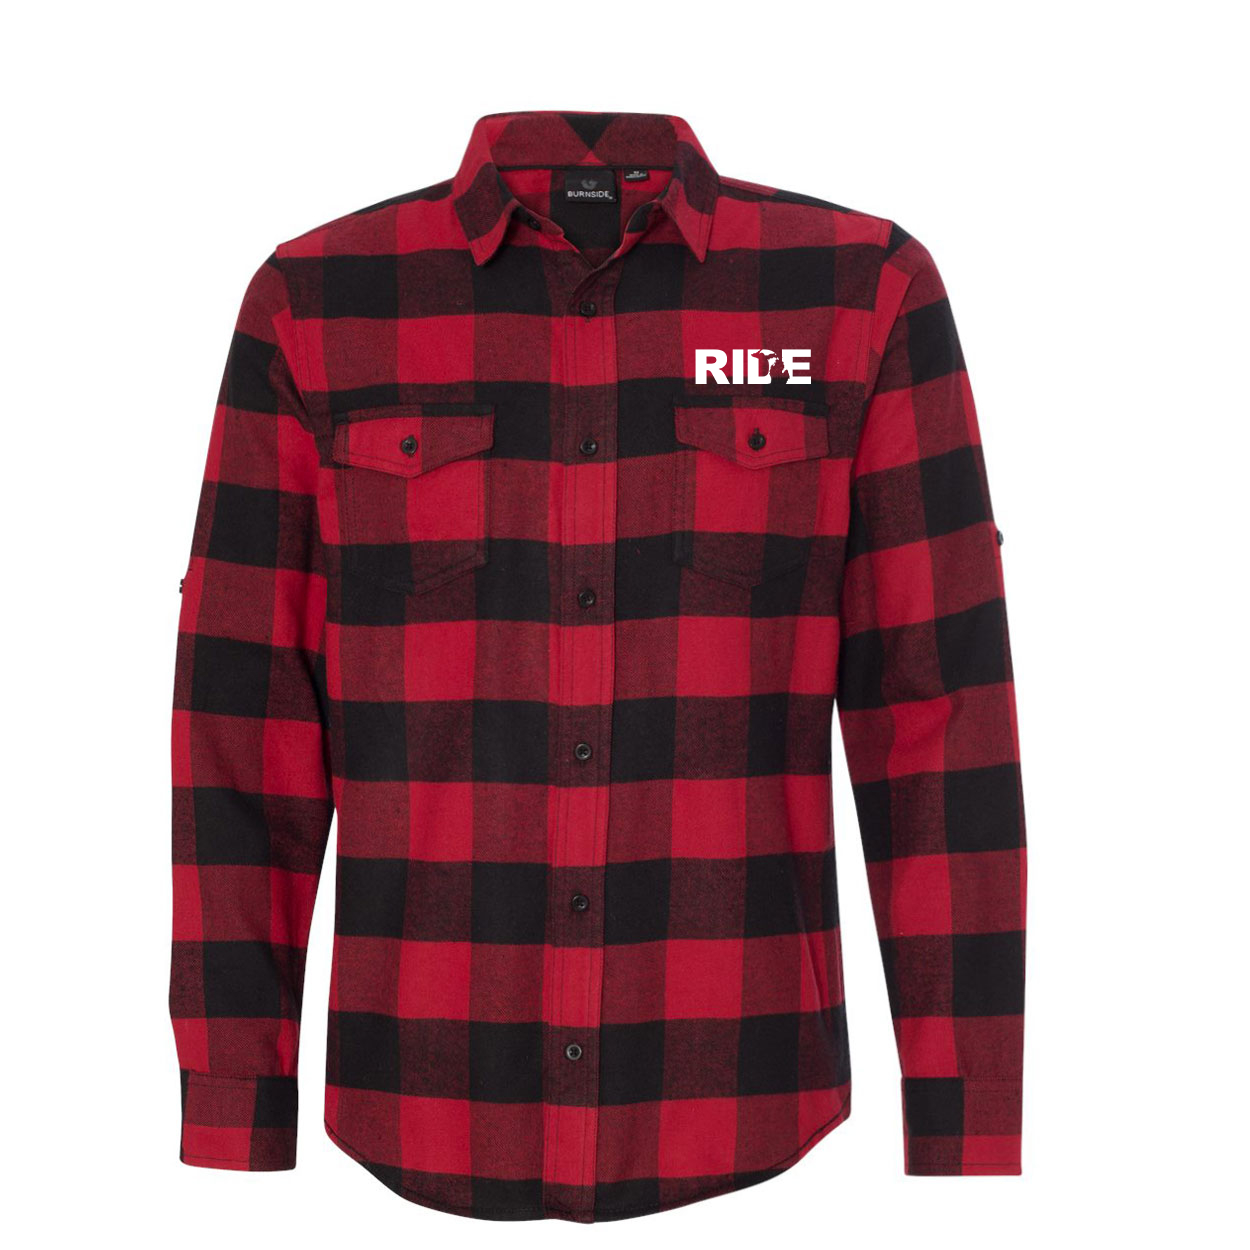 Ride Michigan Classic Unisex Long Sleeve Flannel Shirt Red/Black Buffalo (White Logo)